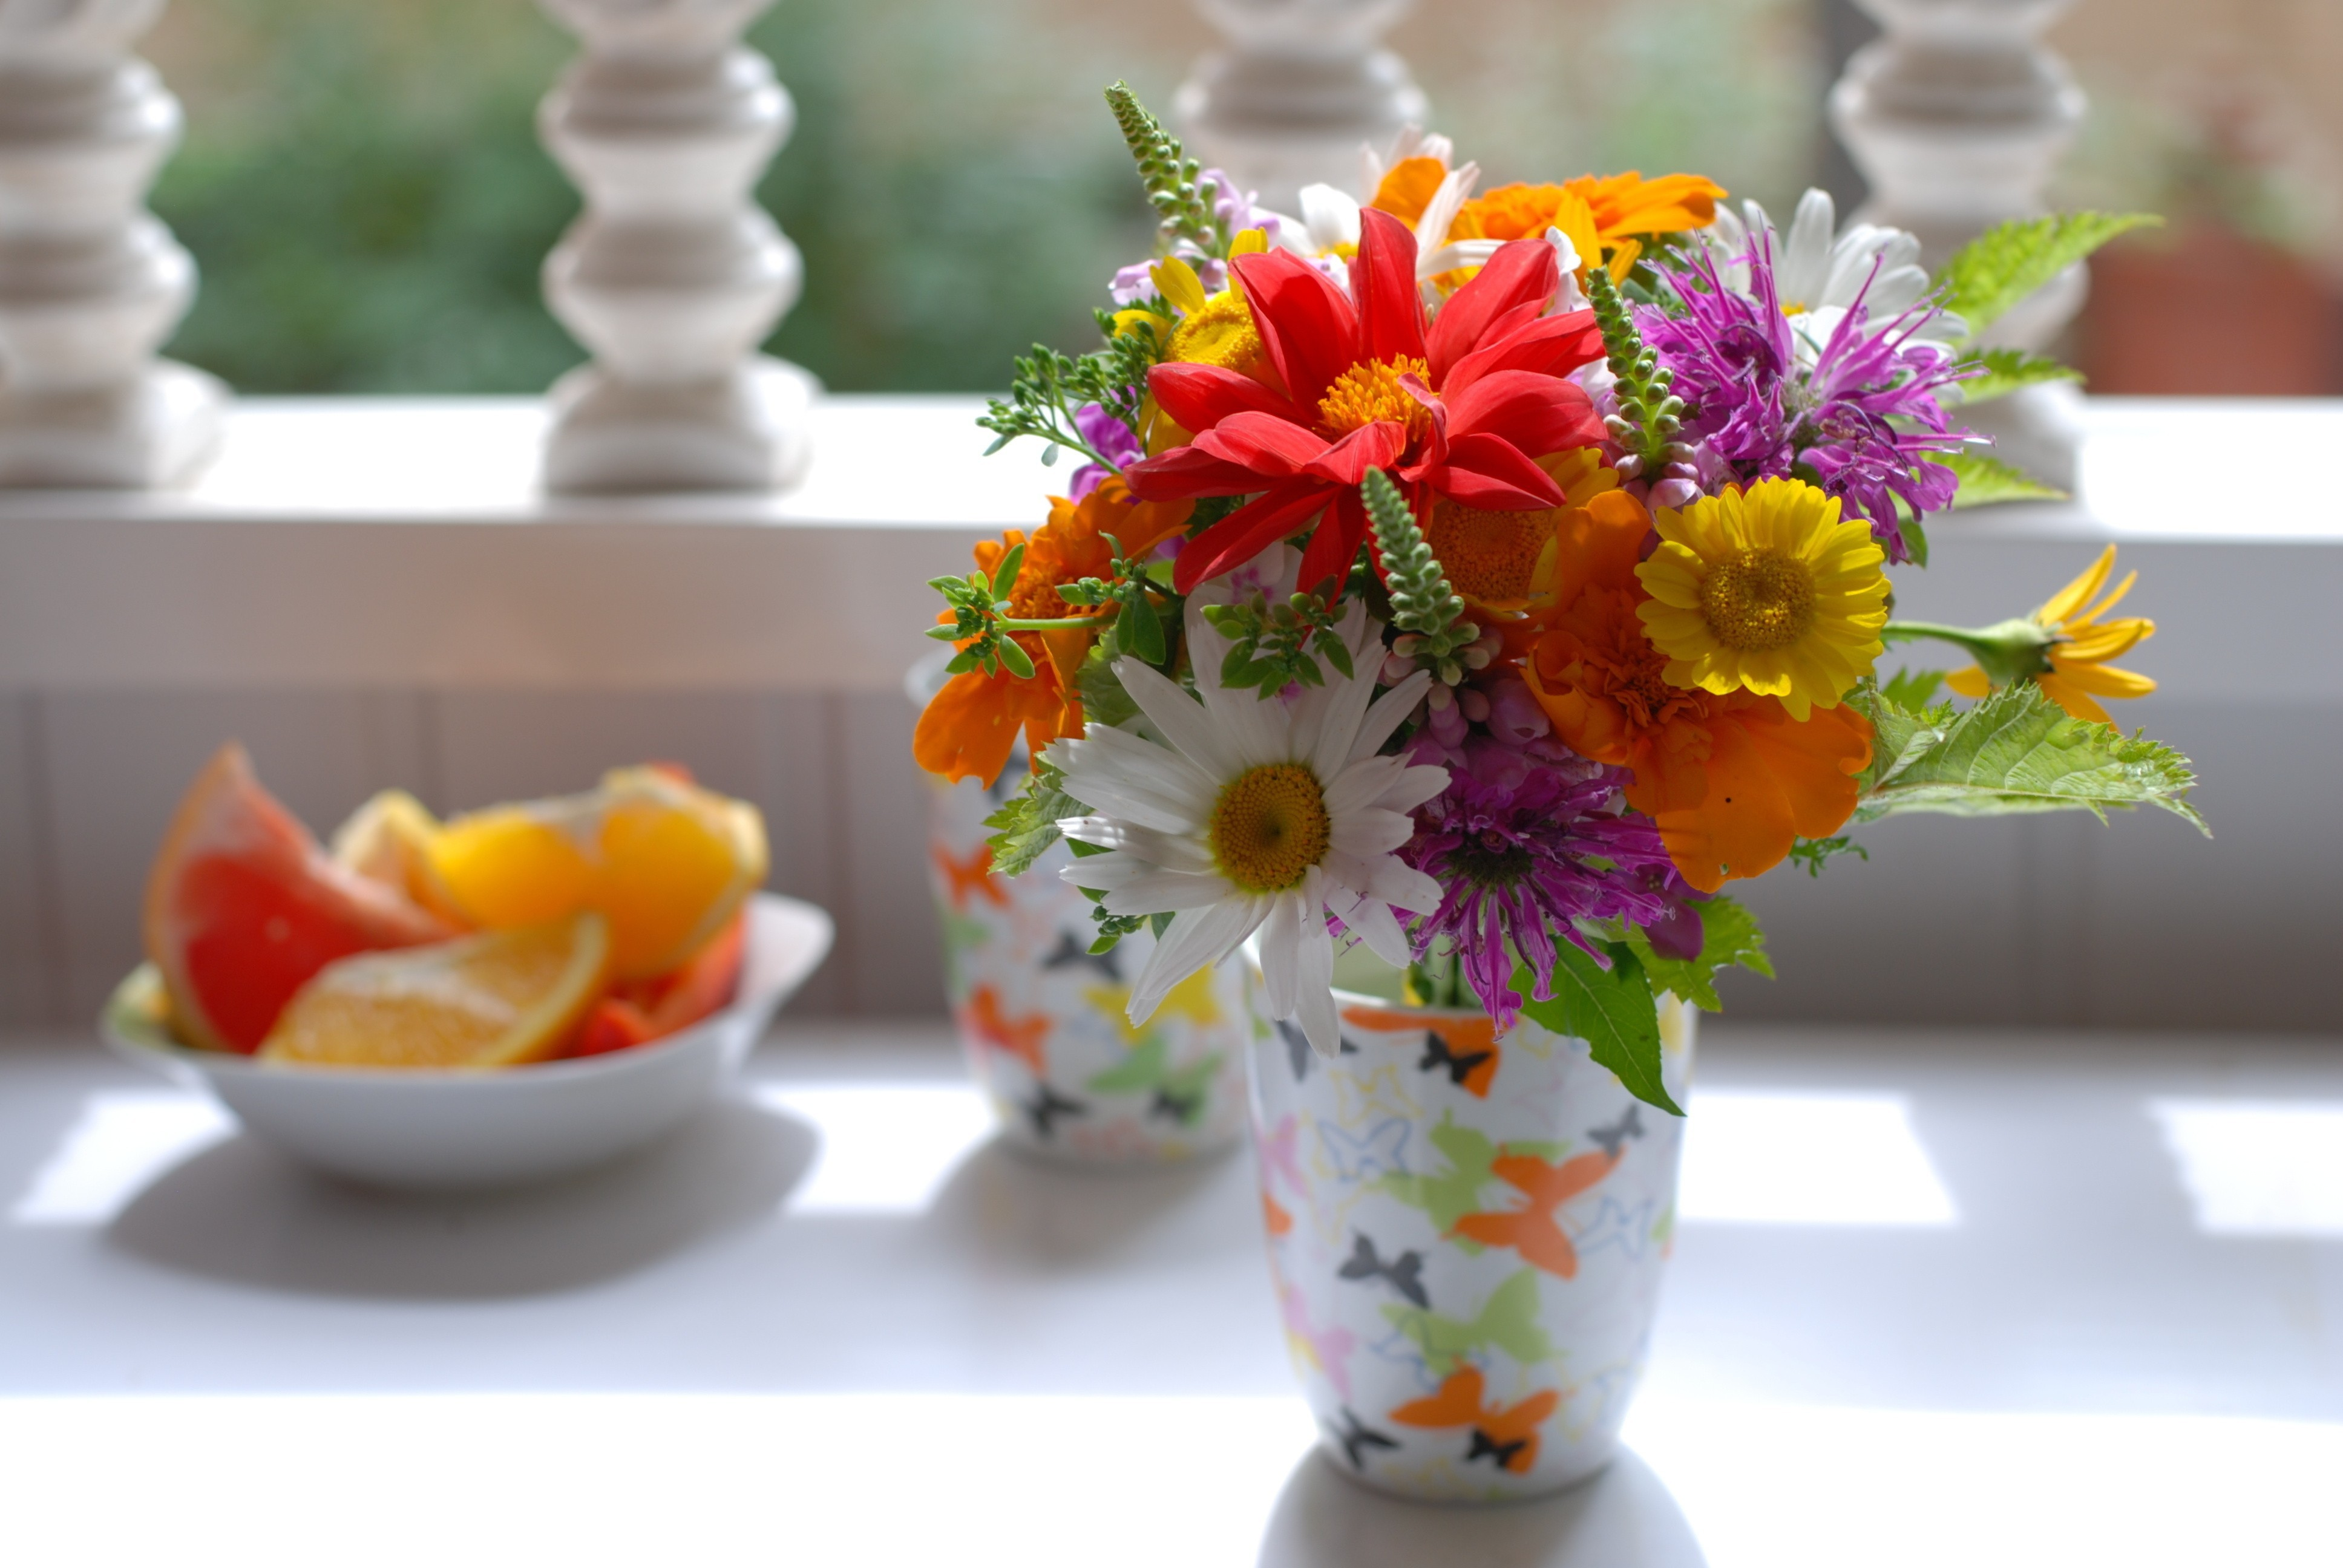 Картинка: Ваза, букет, цветы, фрукты, тень